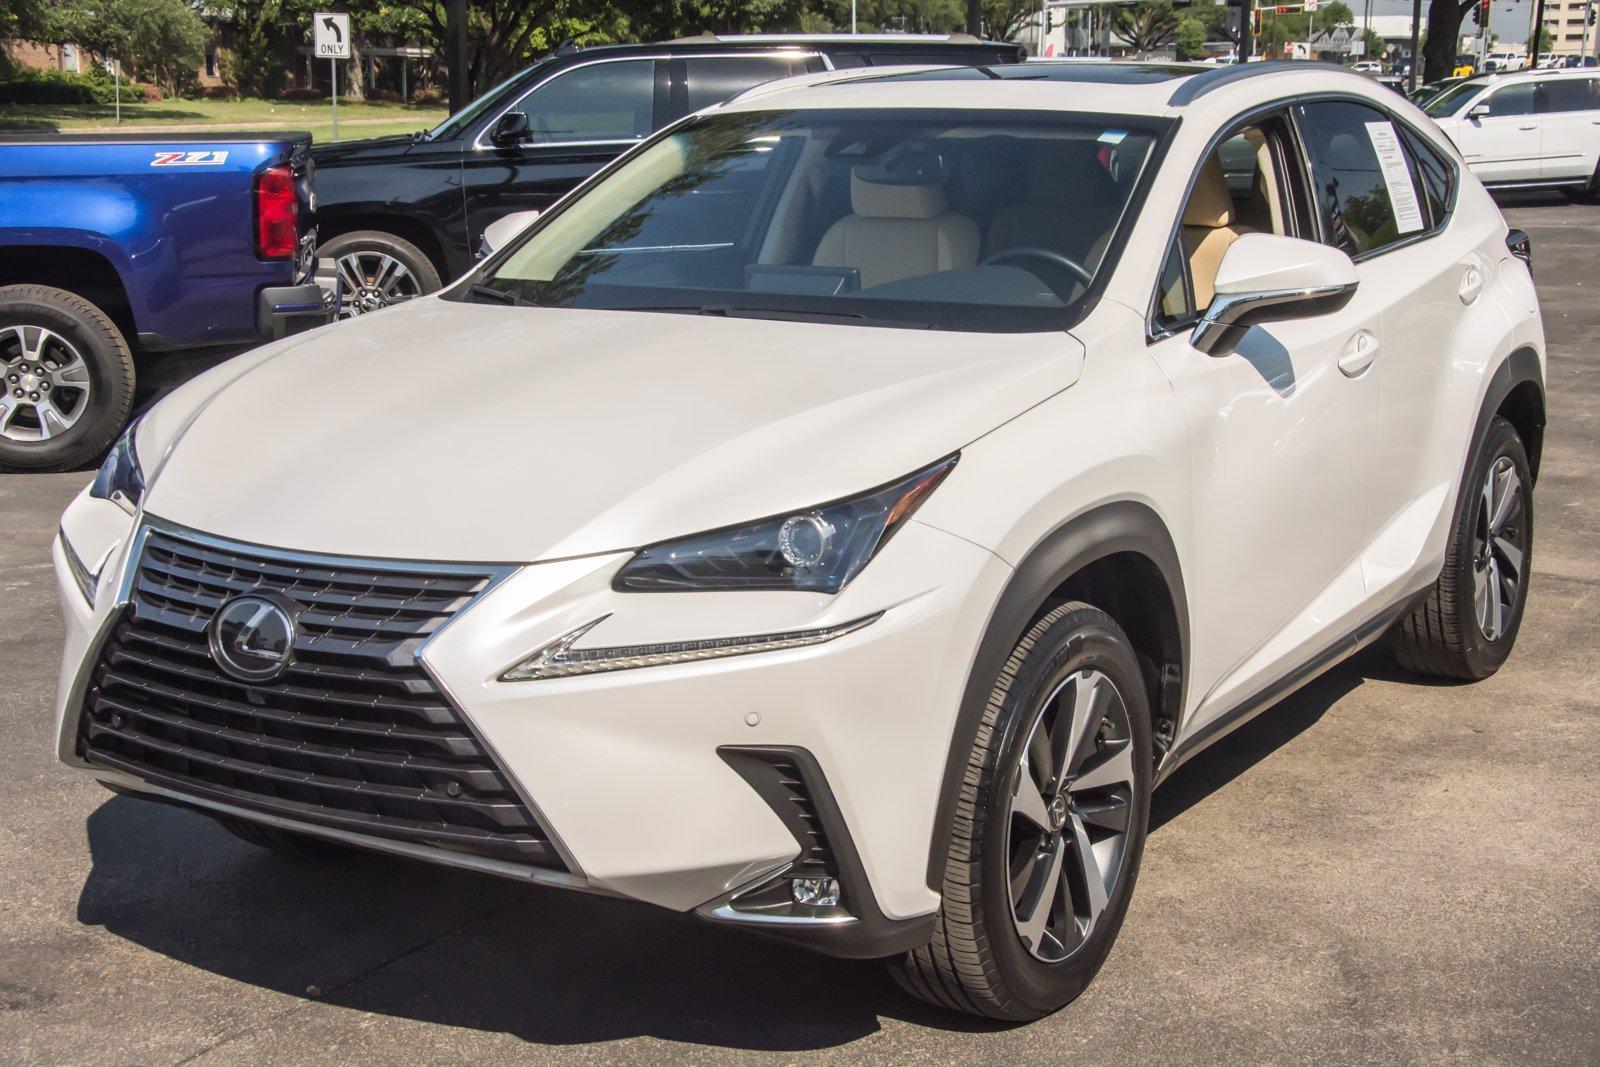 2018 Lexus NX 300 Vehicle Photo in Dallas, TX 75209